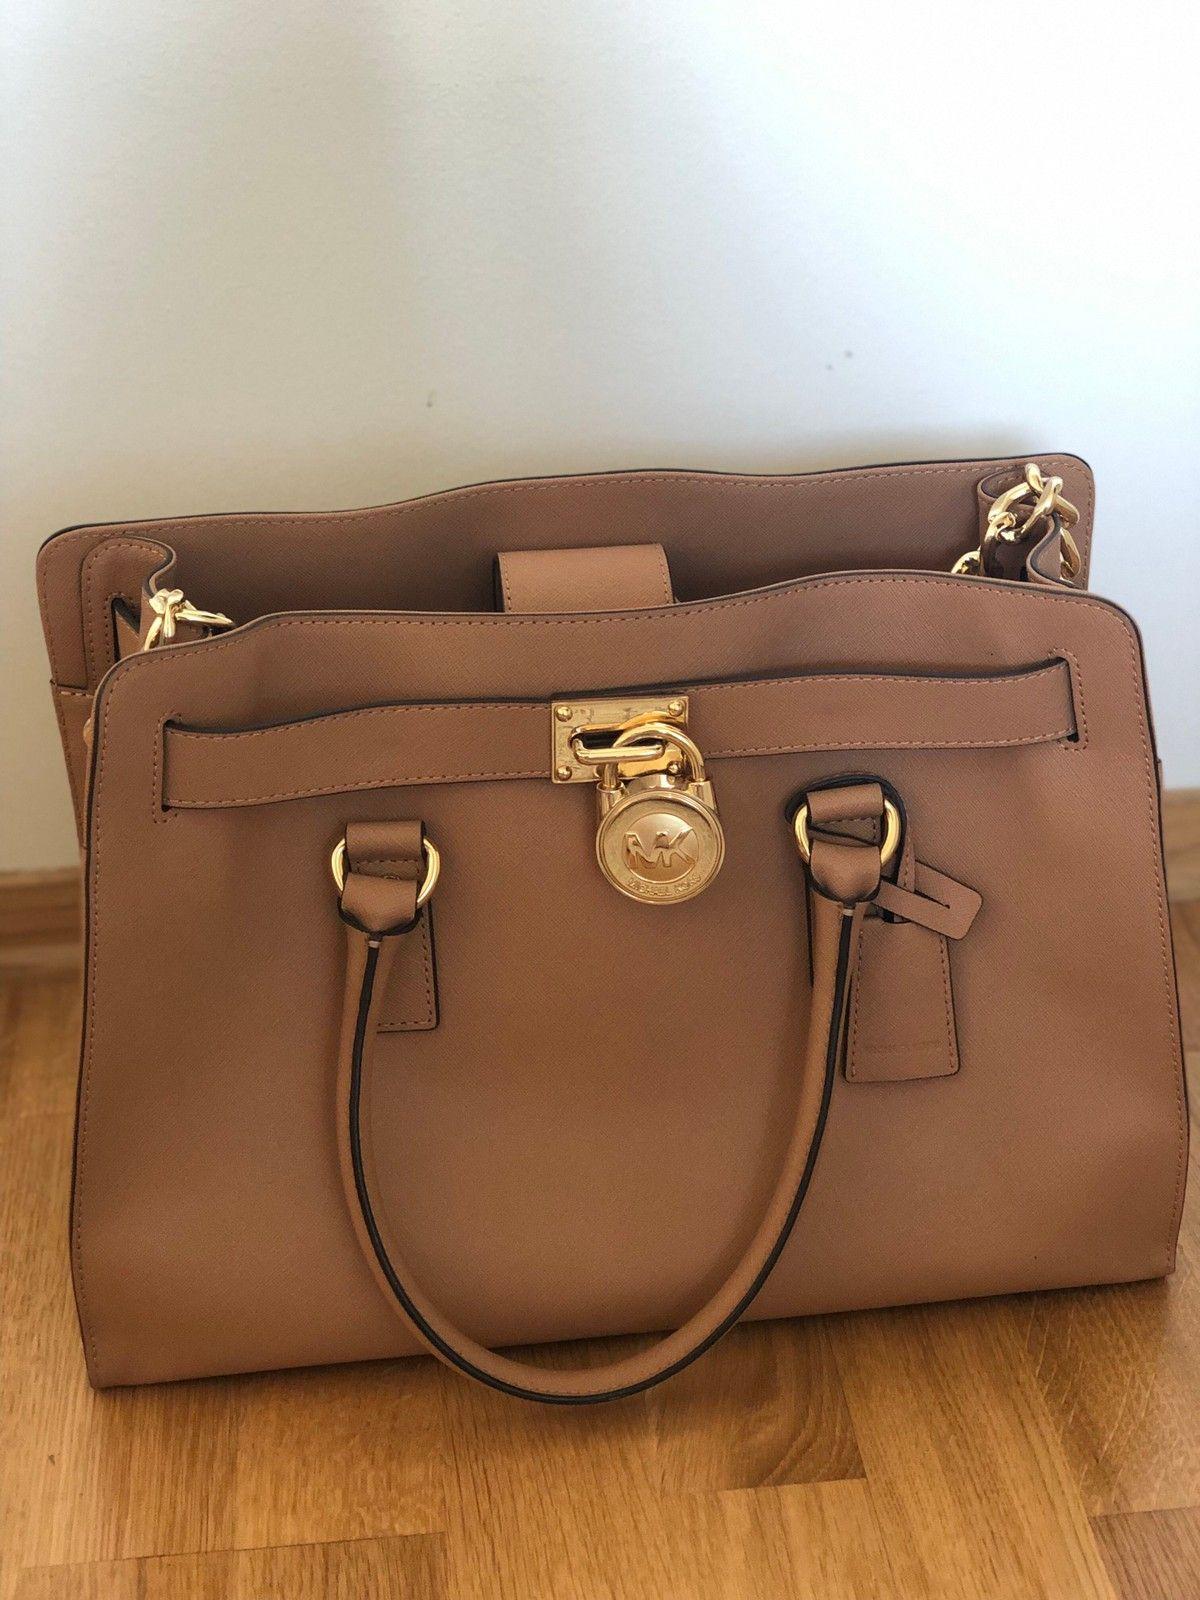 791744cd9 Michael Kors Hamilton bag   FINN.no